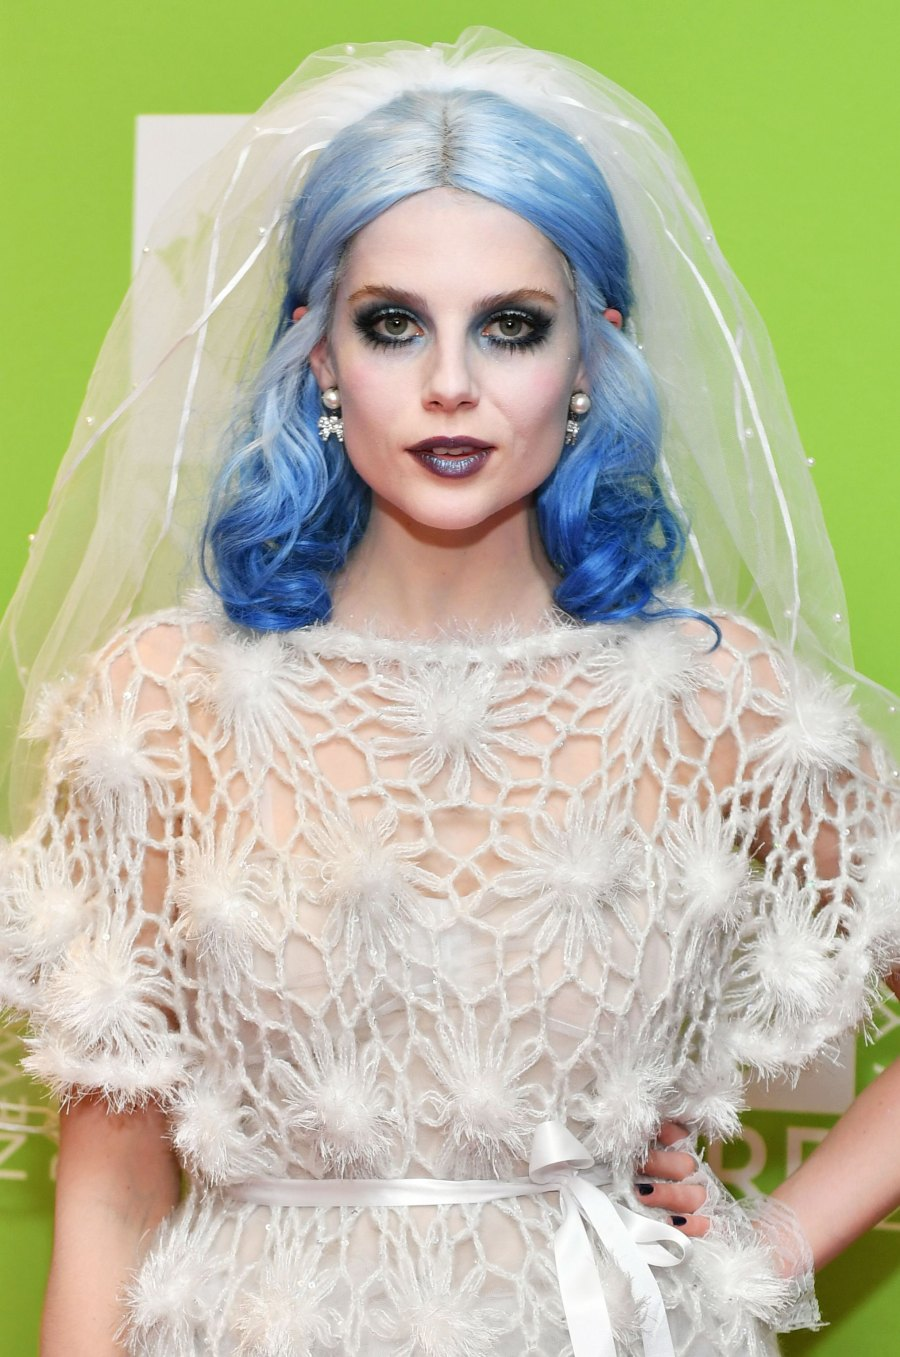 Celebs in Wigs Halloween Edition - Lucy Boynton